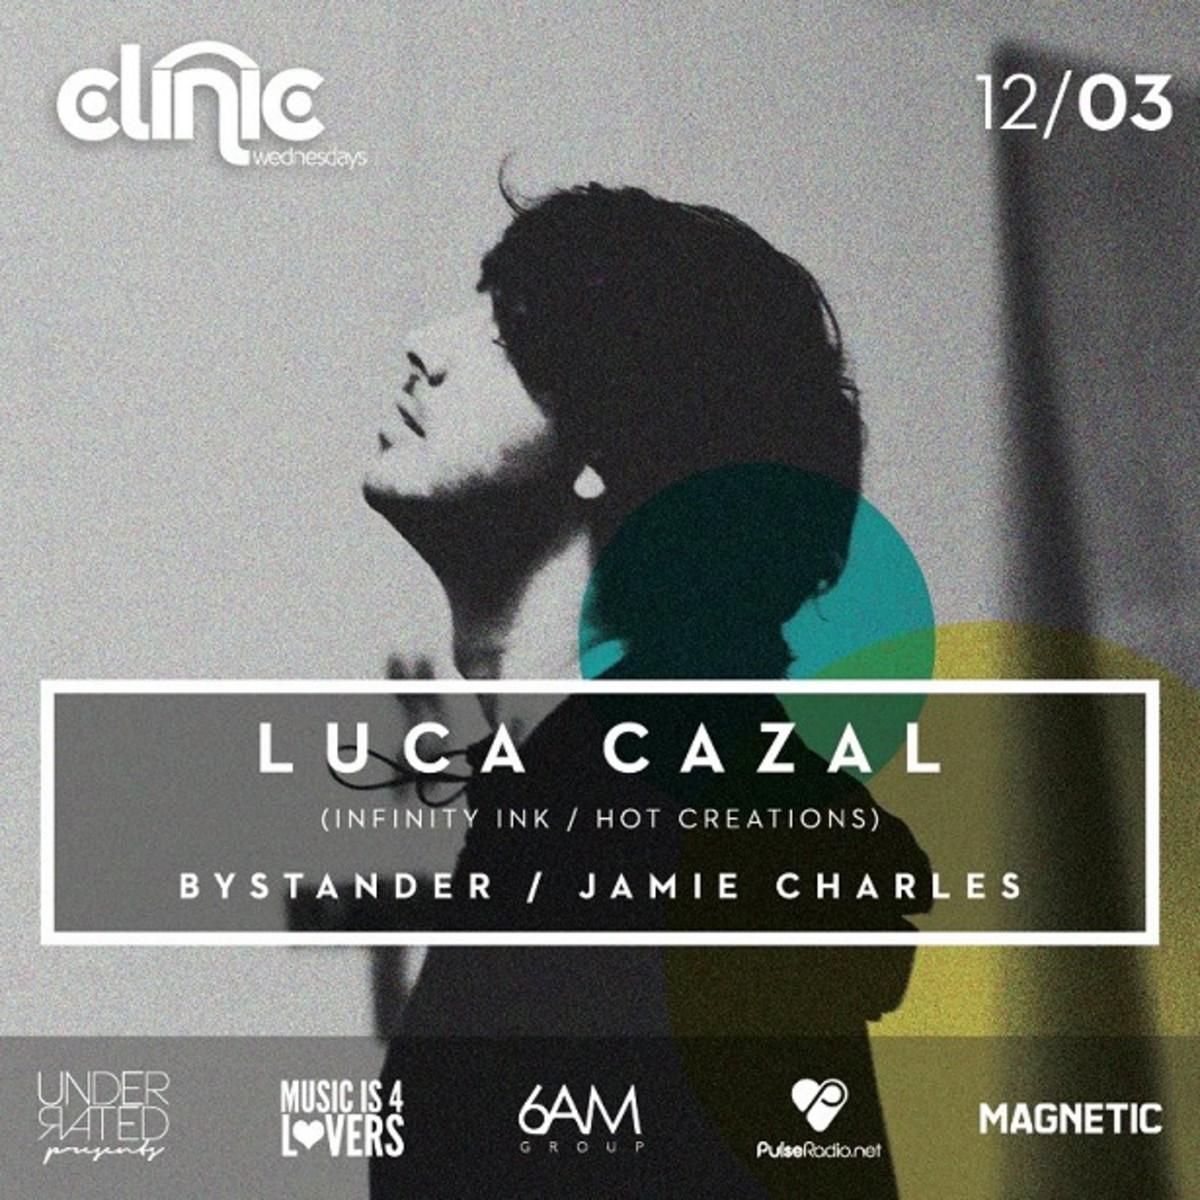 LucaC